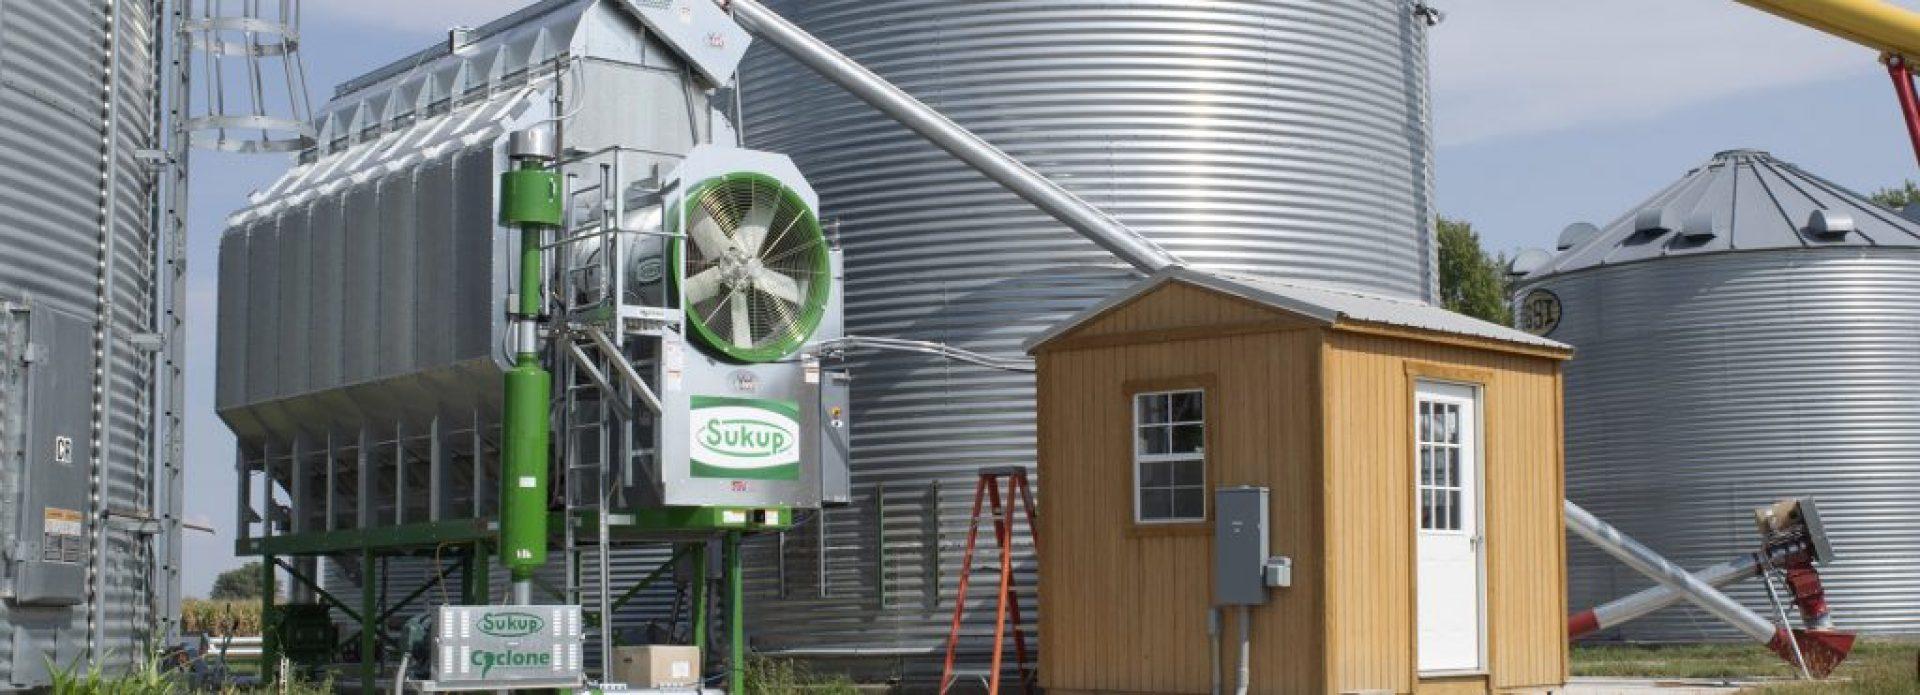 Eldon-C-Stutsman-Inc-Grain-Handling (1)